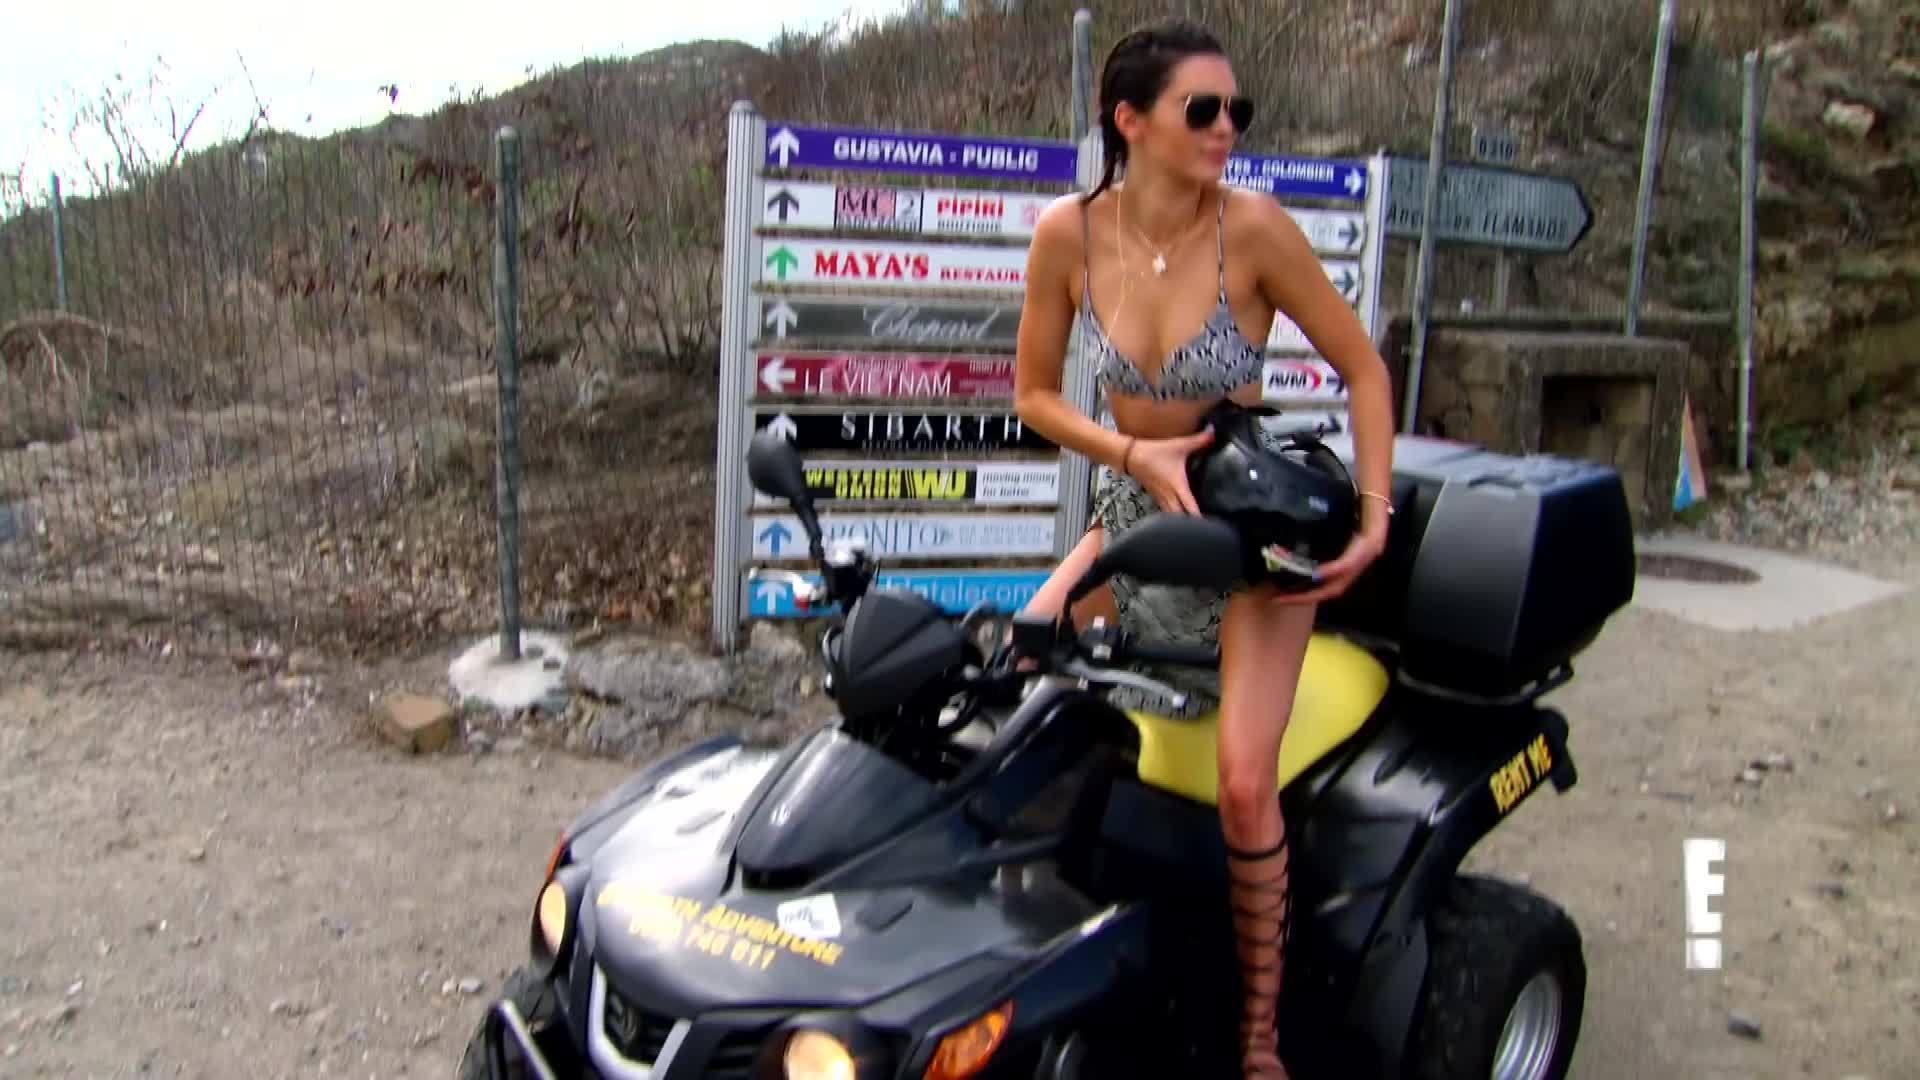 celebs, kardashian, keeping up with the kardashians, keeping up with the kardashians (tv program), kendall, kendall jenner, kendall jenner (author), khloé kardashian (celebrity), model, sexy, Kendall Jenner Races Khloe Kardashian In Bikinis - KUWTK Preview GIFs